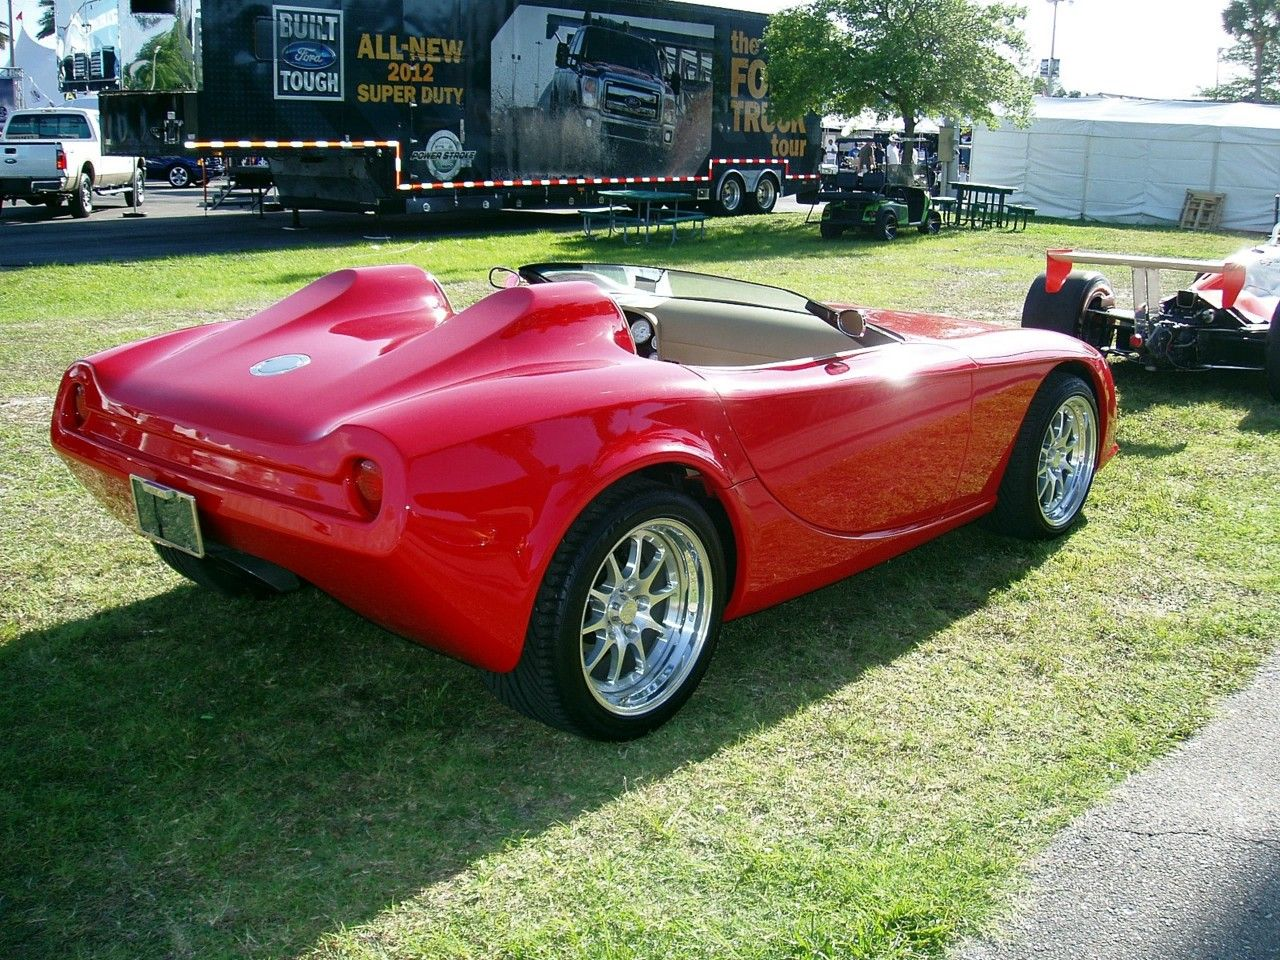 Kit Car Kit Cars Replica Cars Hot Cars